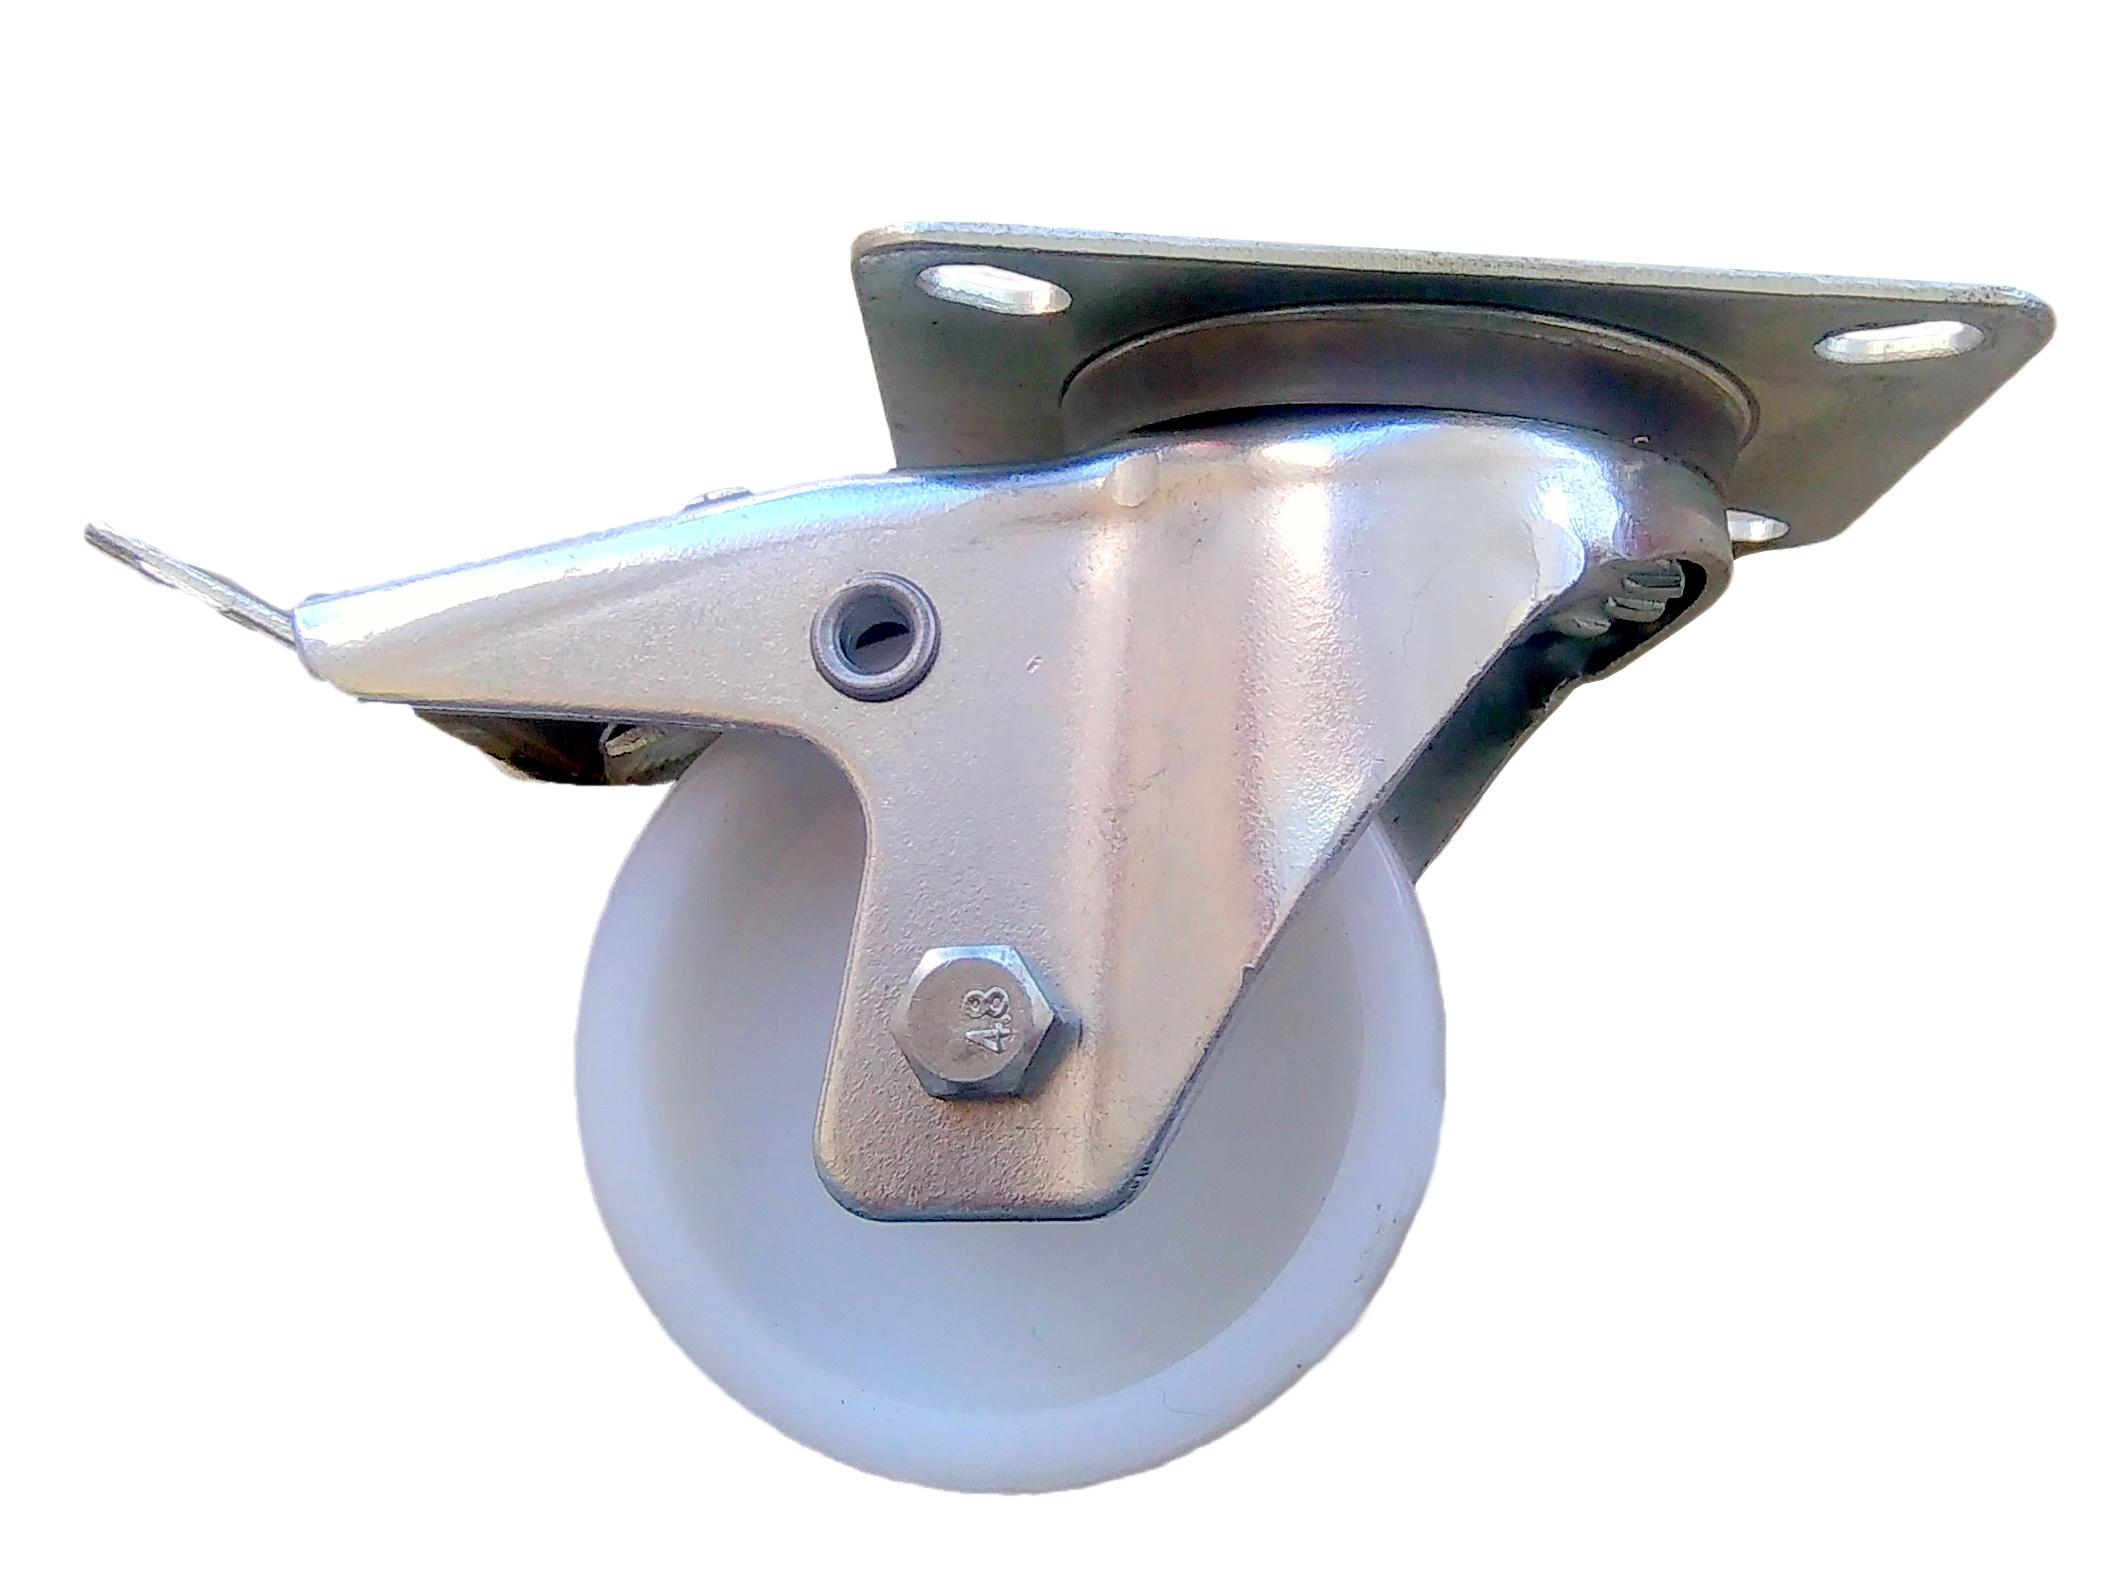 Kruh kolesá 80 mm 90 kg Polyamid metla